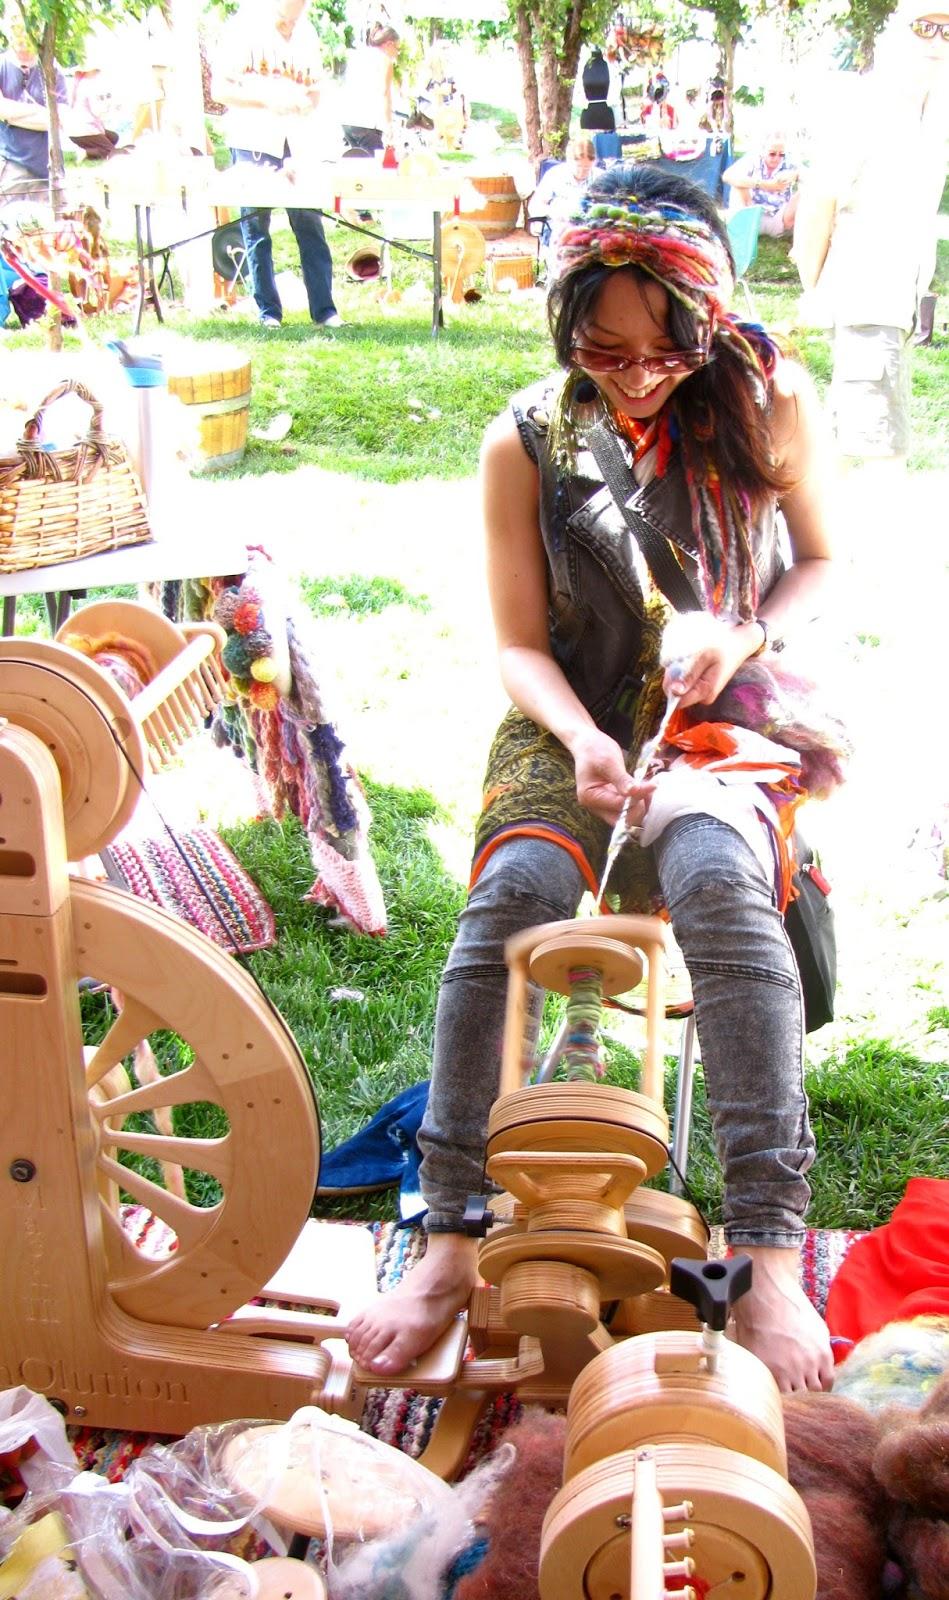 The Hopper is the Original Art Yarn Travel wheel.